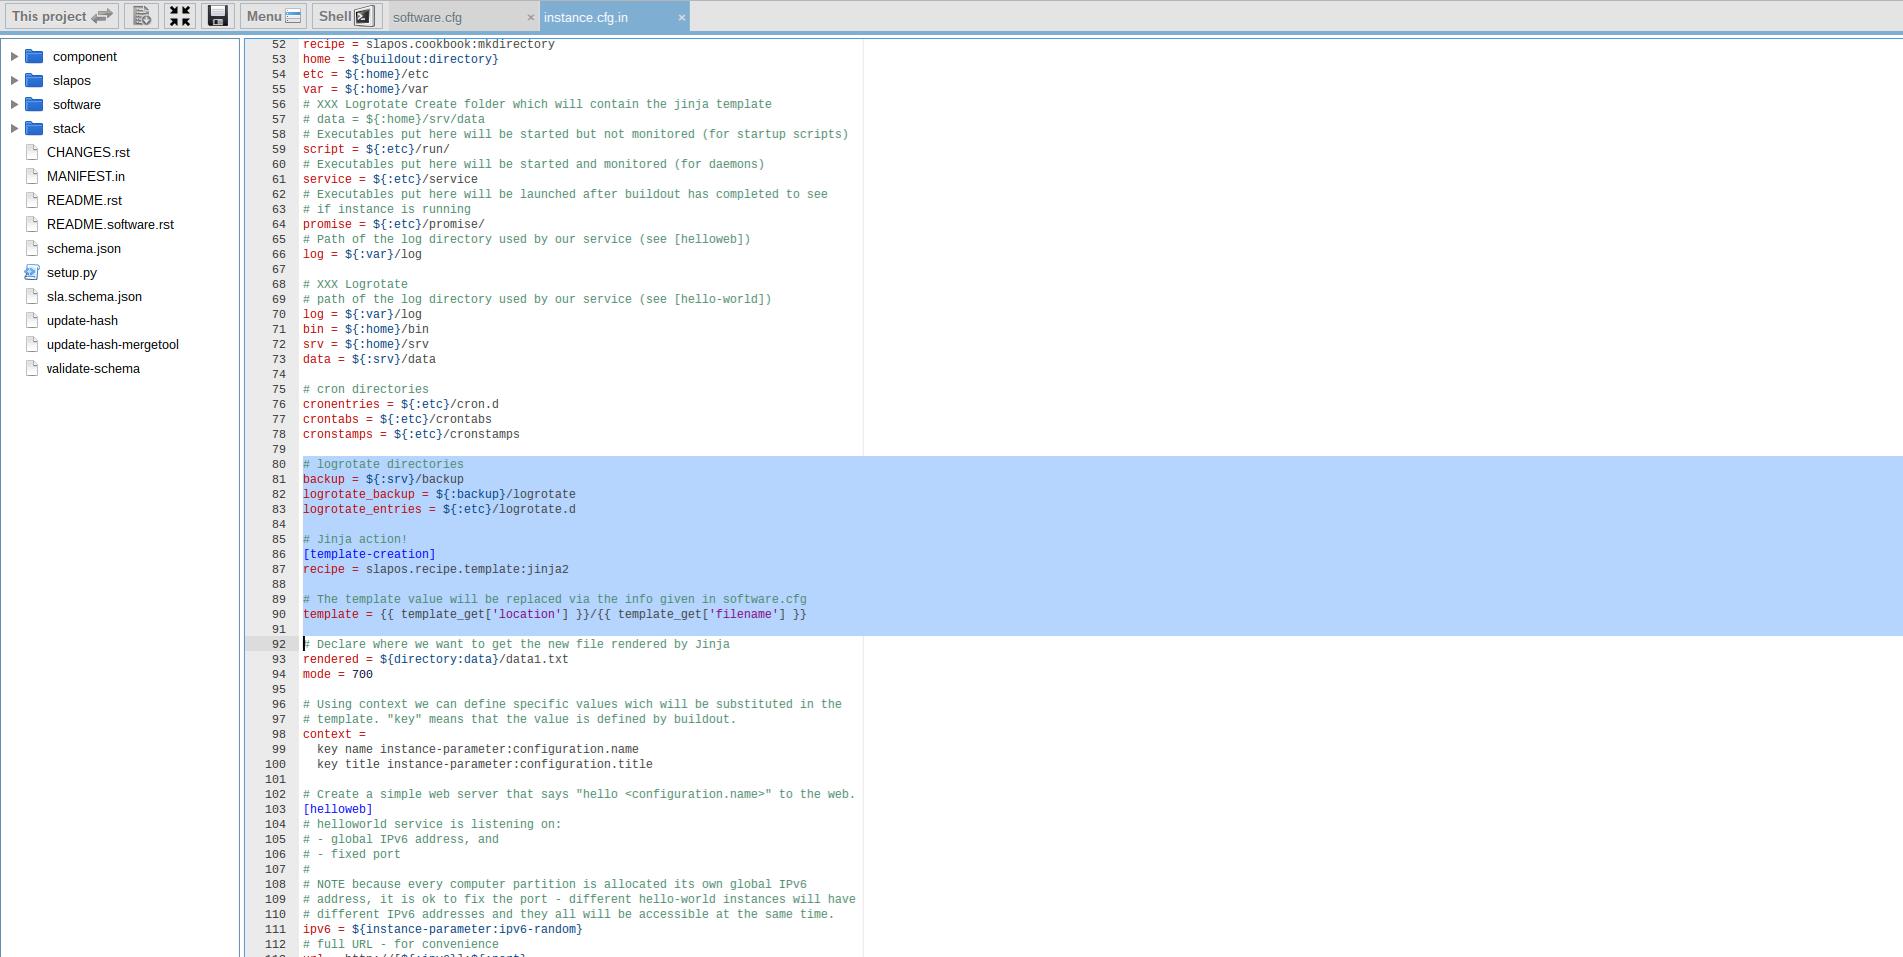 Debug SlapOS Node - Webrunner Interface - Software Profile Templates